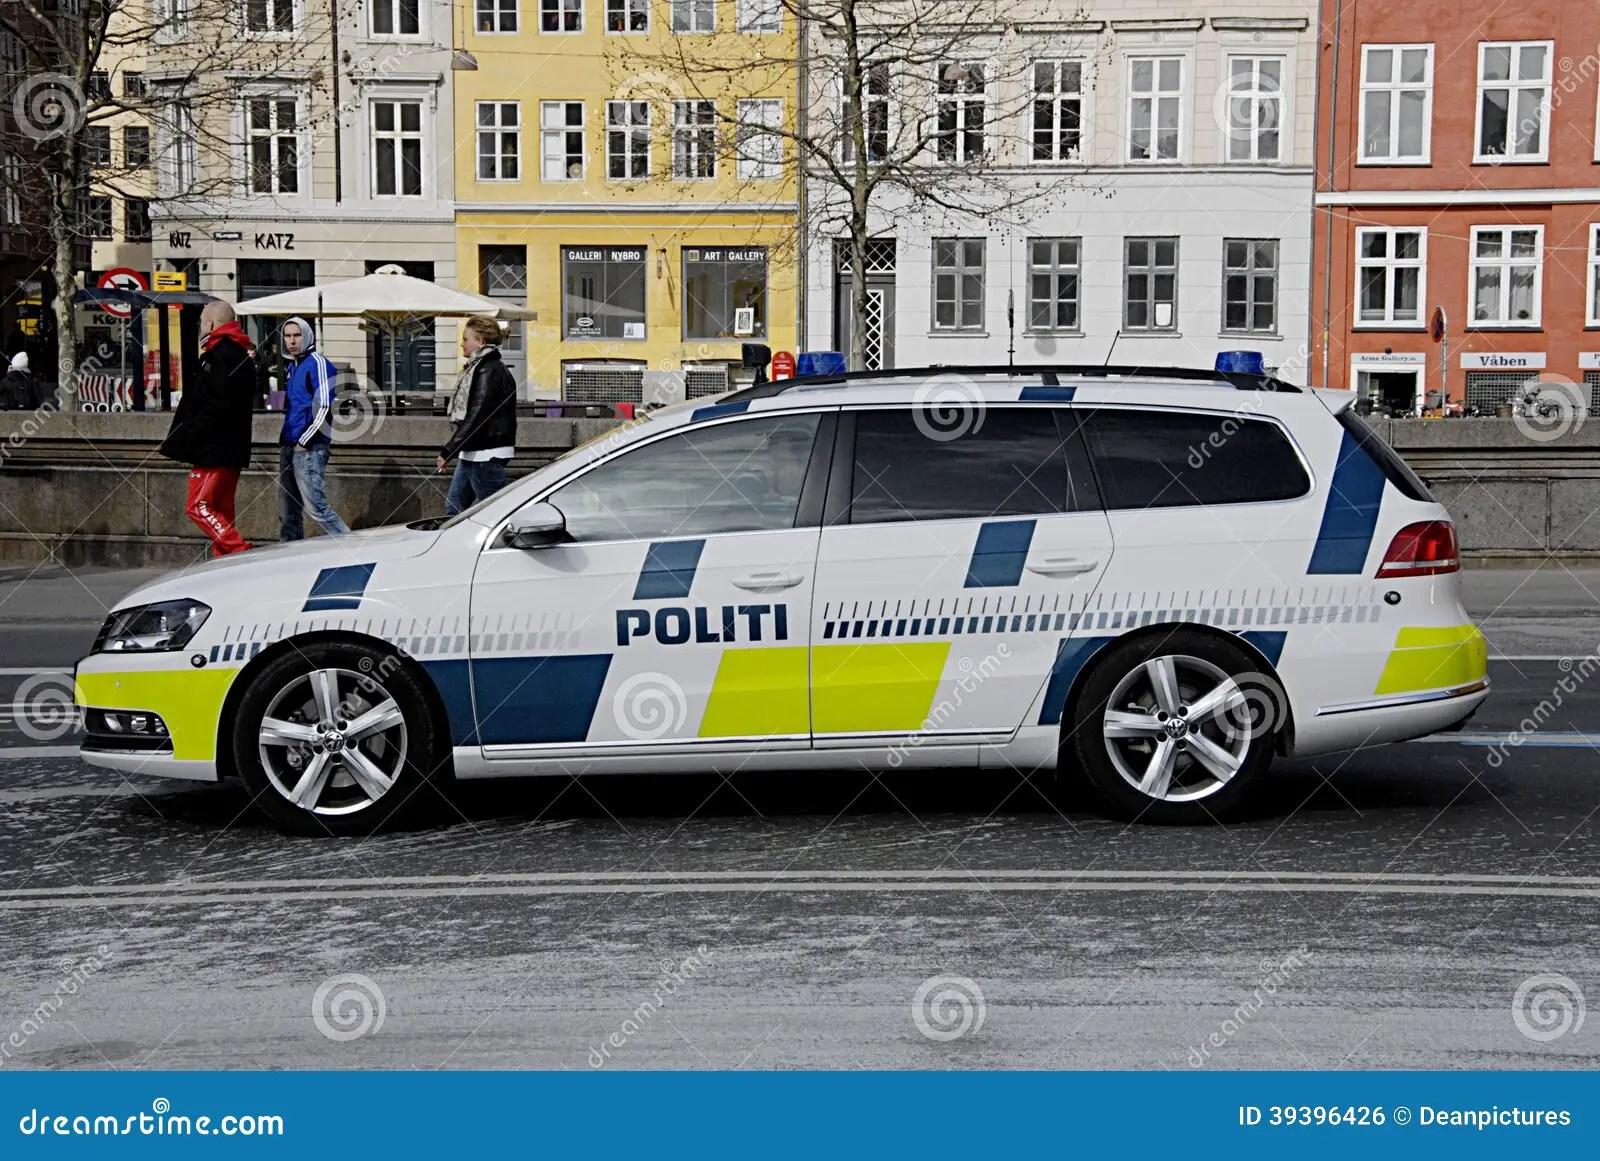 Gta 5 Cars Wallpaper Download Denmark Danish Police Auto Editorial Photo Image Of